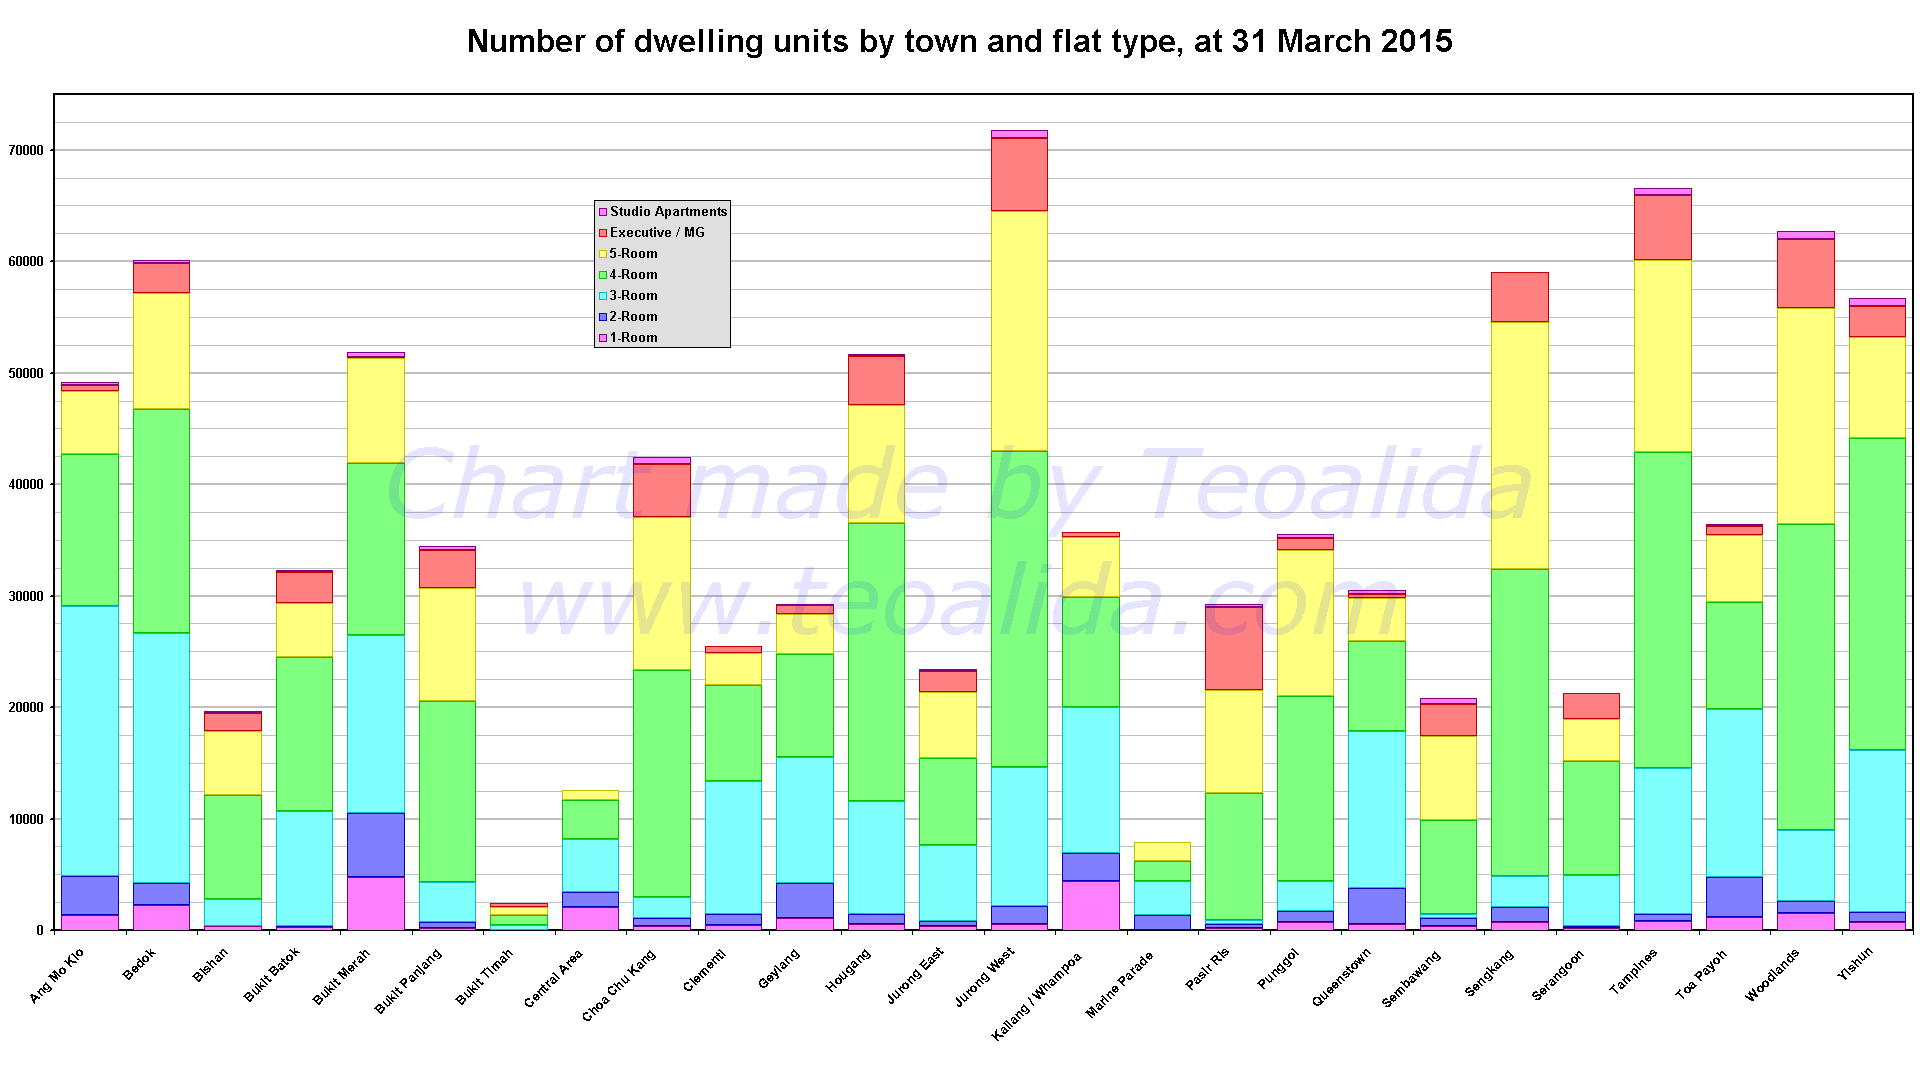 HDB dwelling units per town and flat type